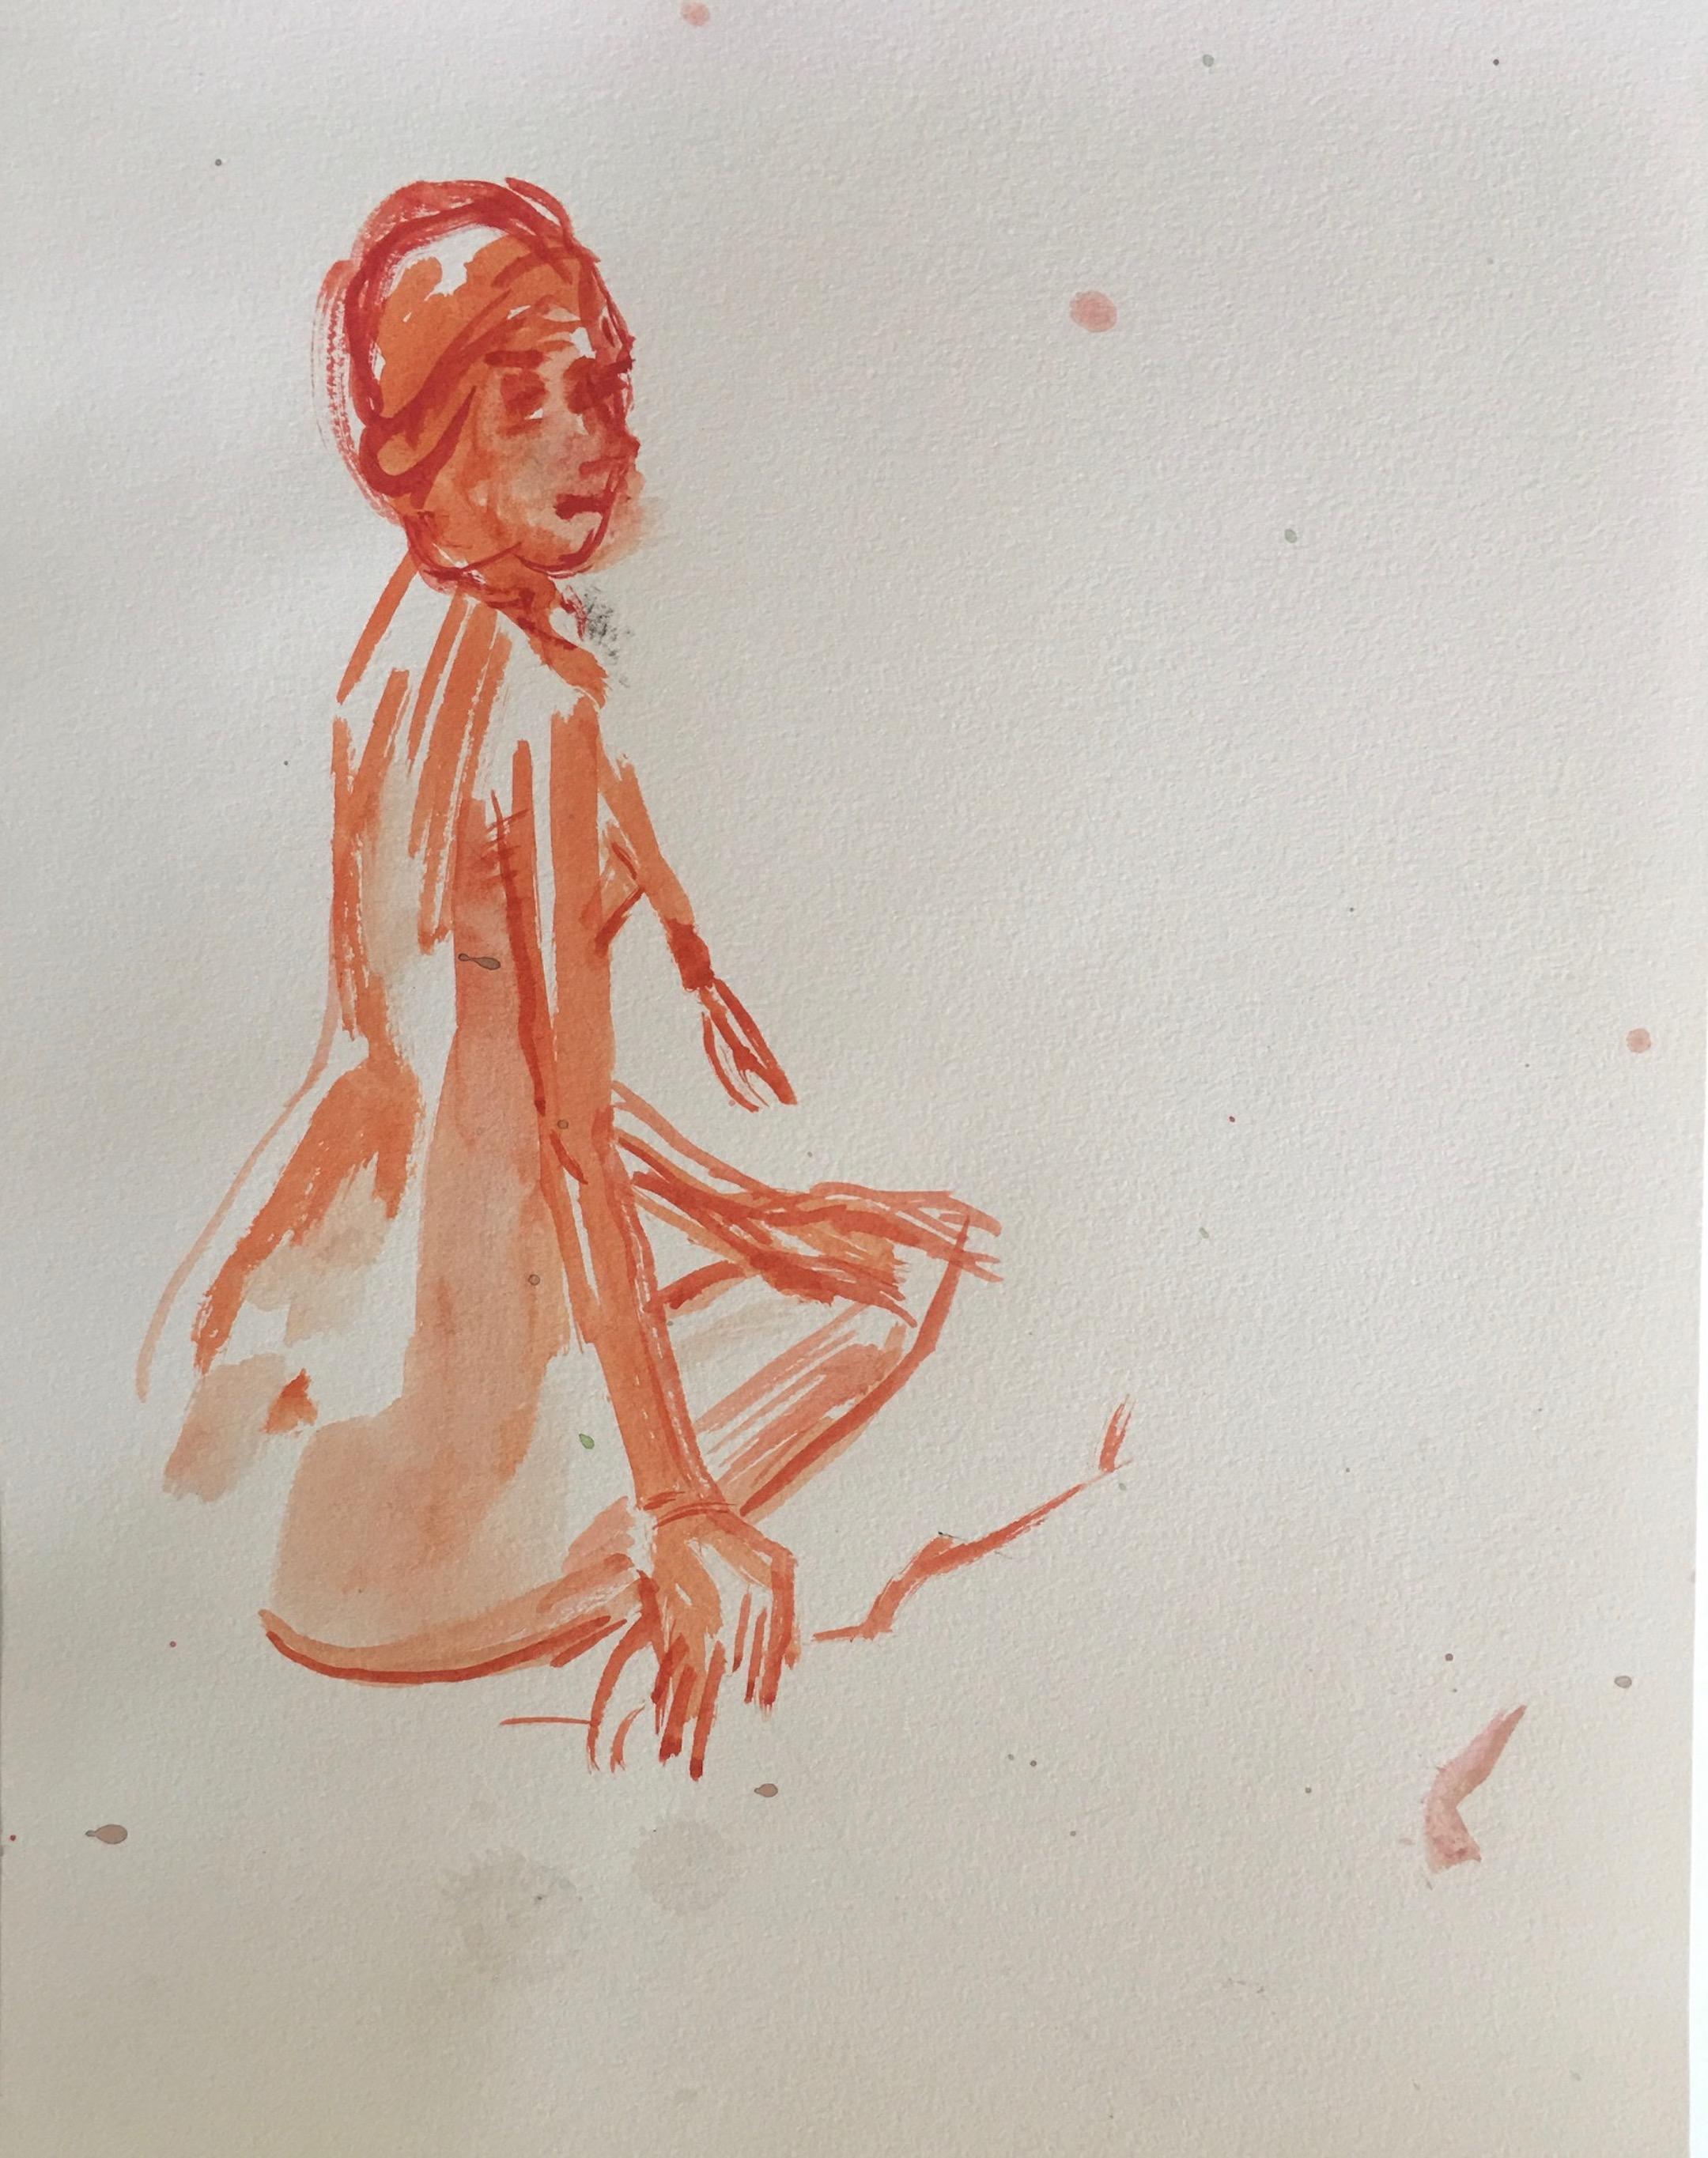 NYC figure caricature